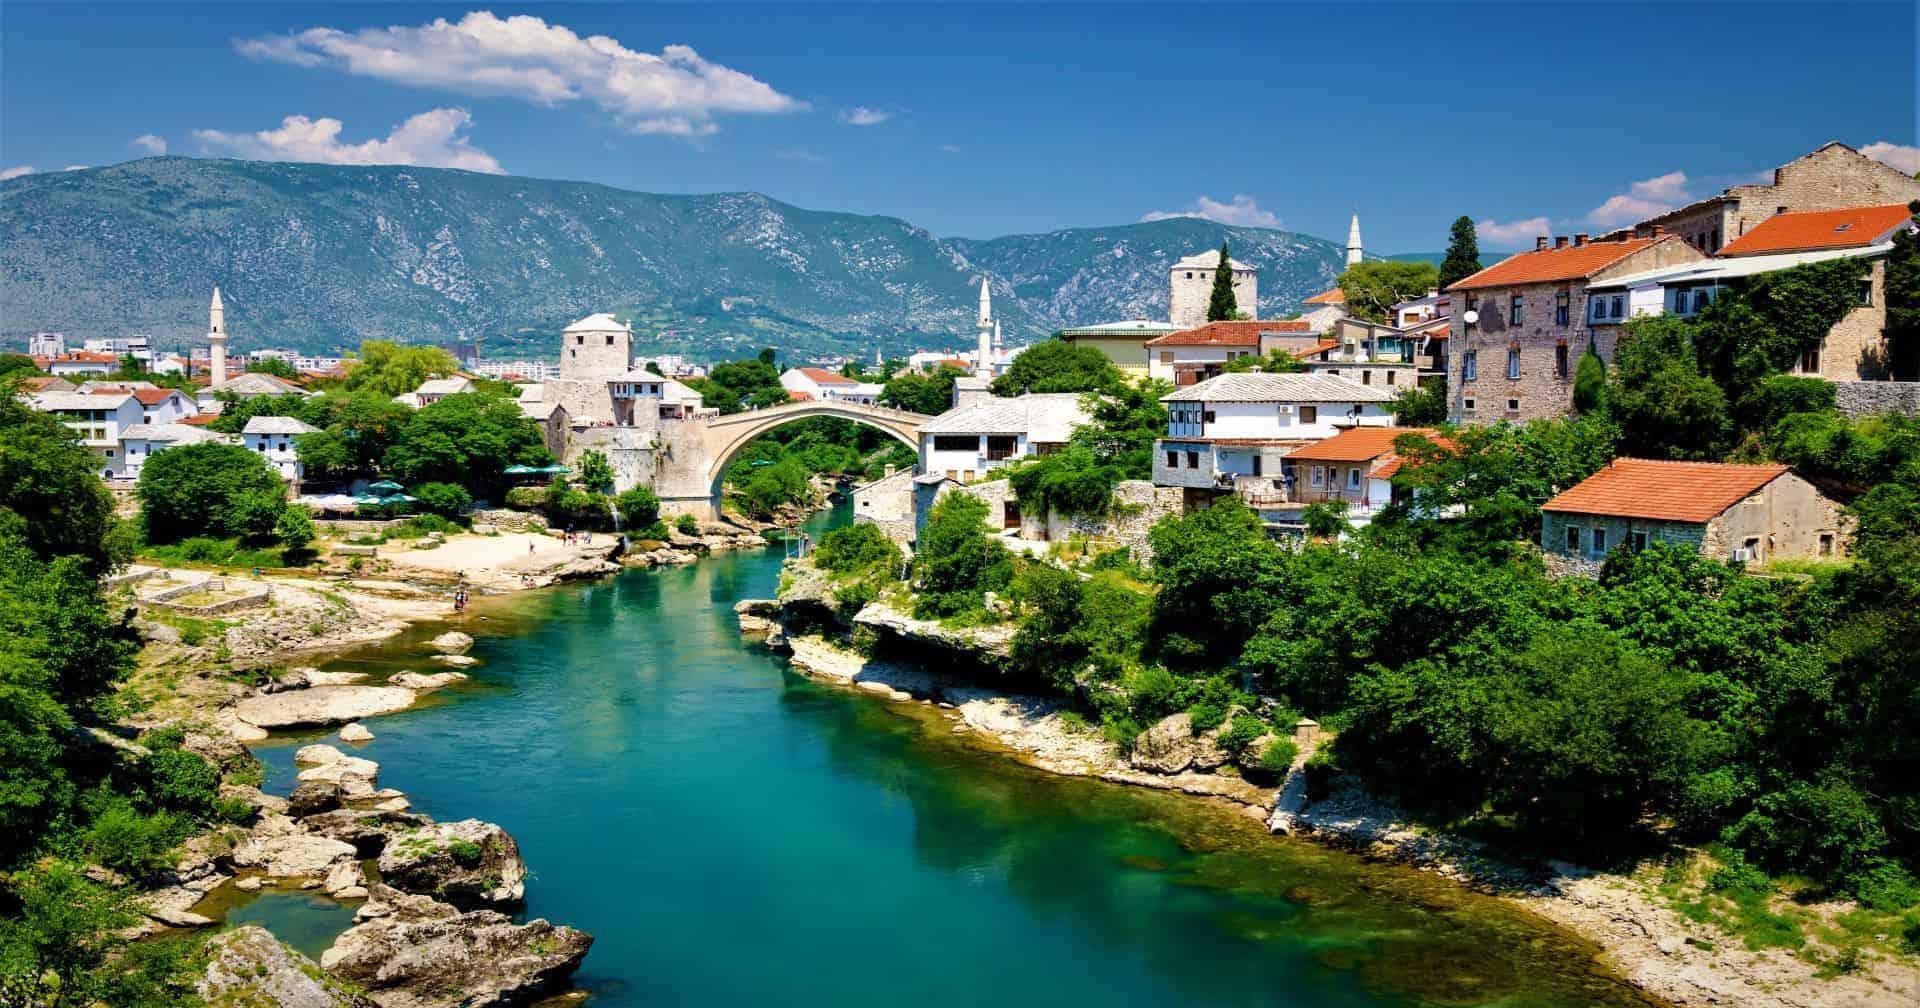 Old Bridge in Mostar Bosnia and Herzegovina